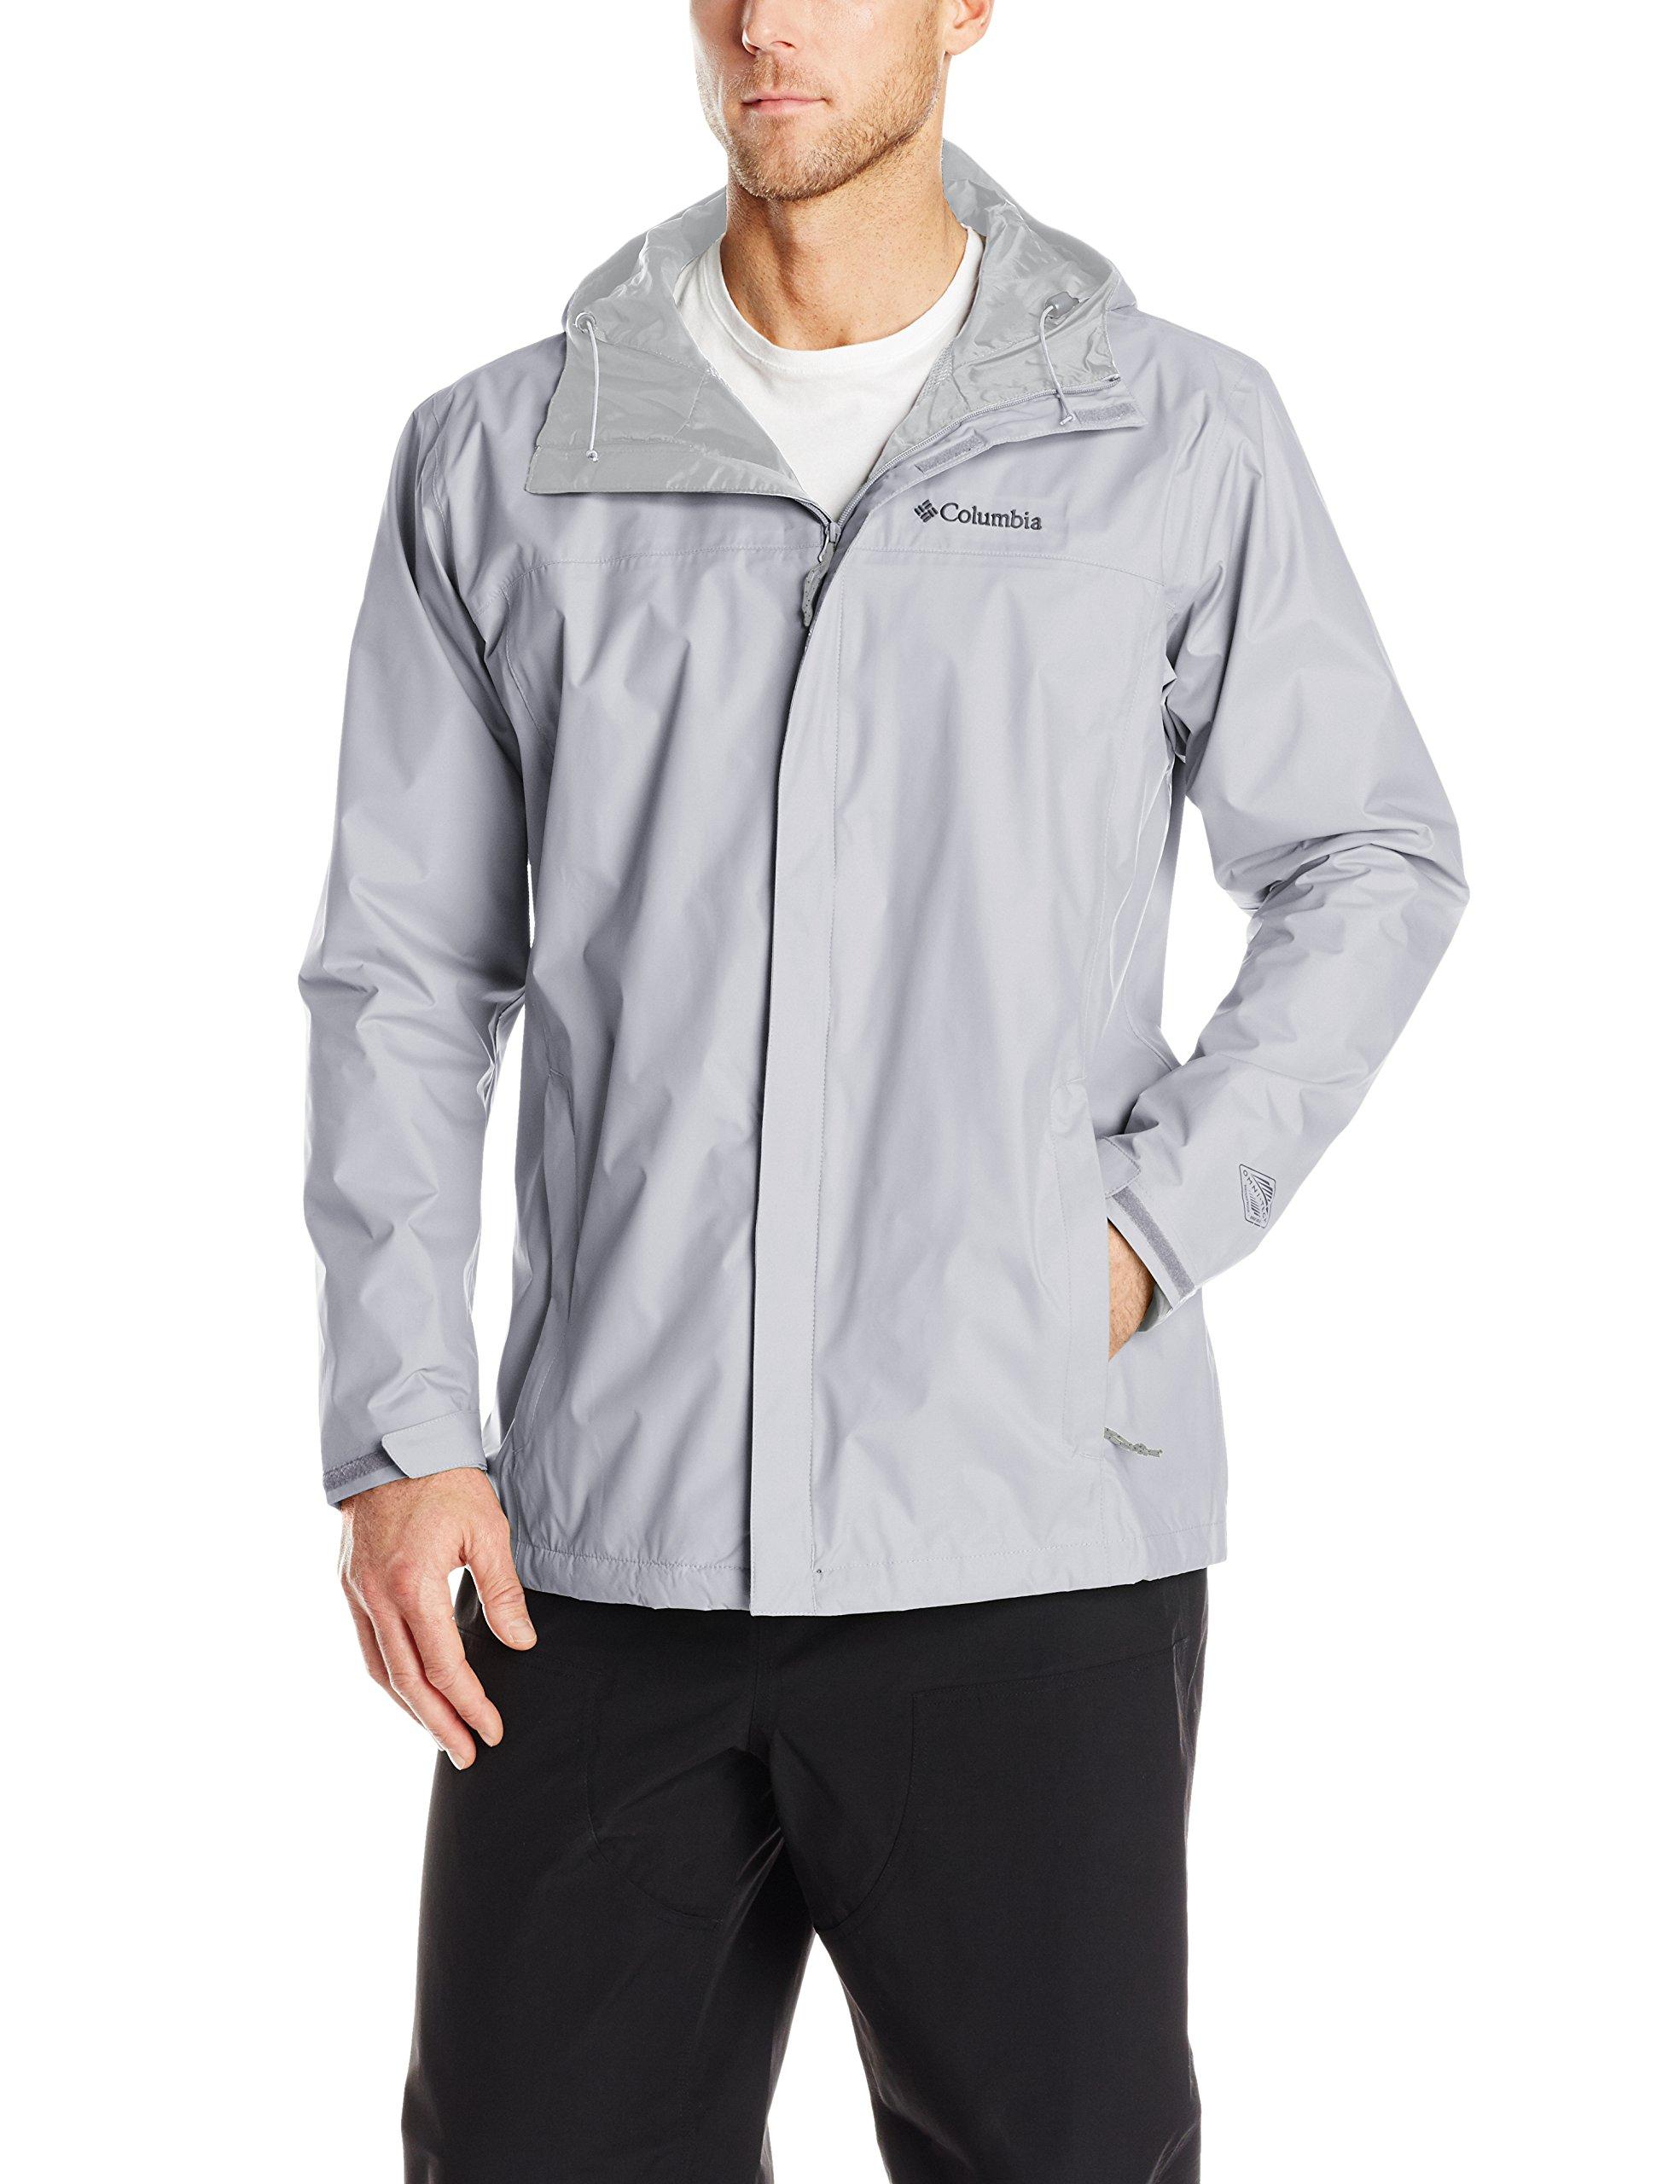 Columbia Men's Big & Tall Watertight II Packable Rain Jacket,Columbia Grey,3X/Tall